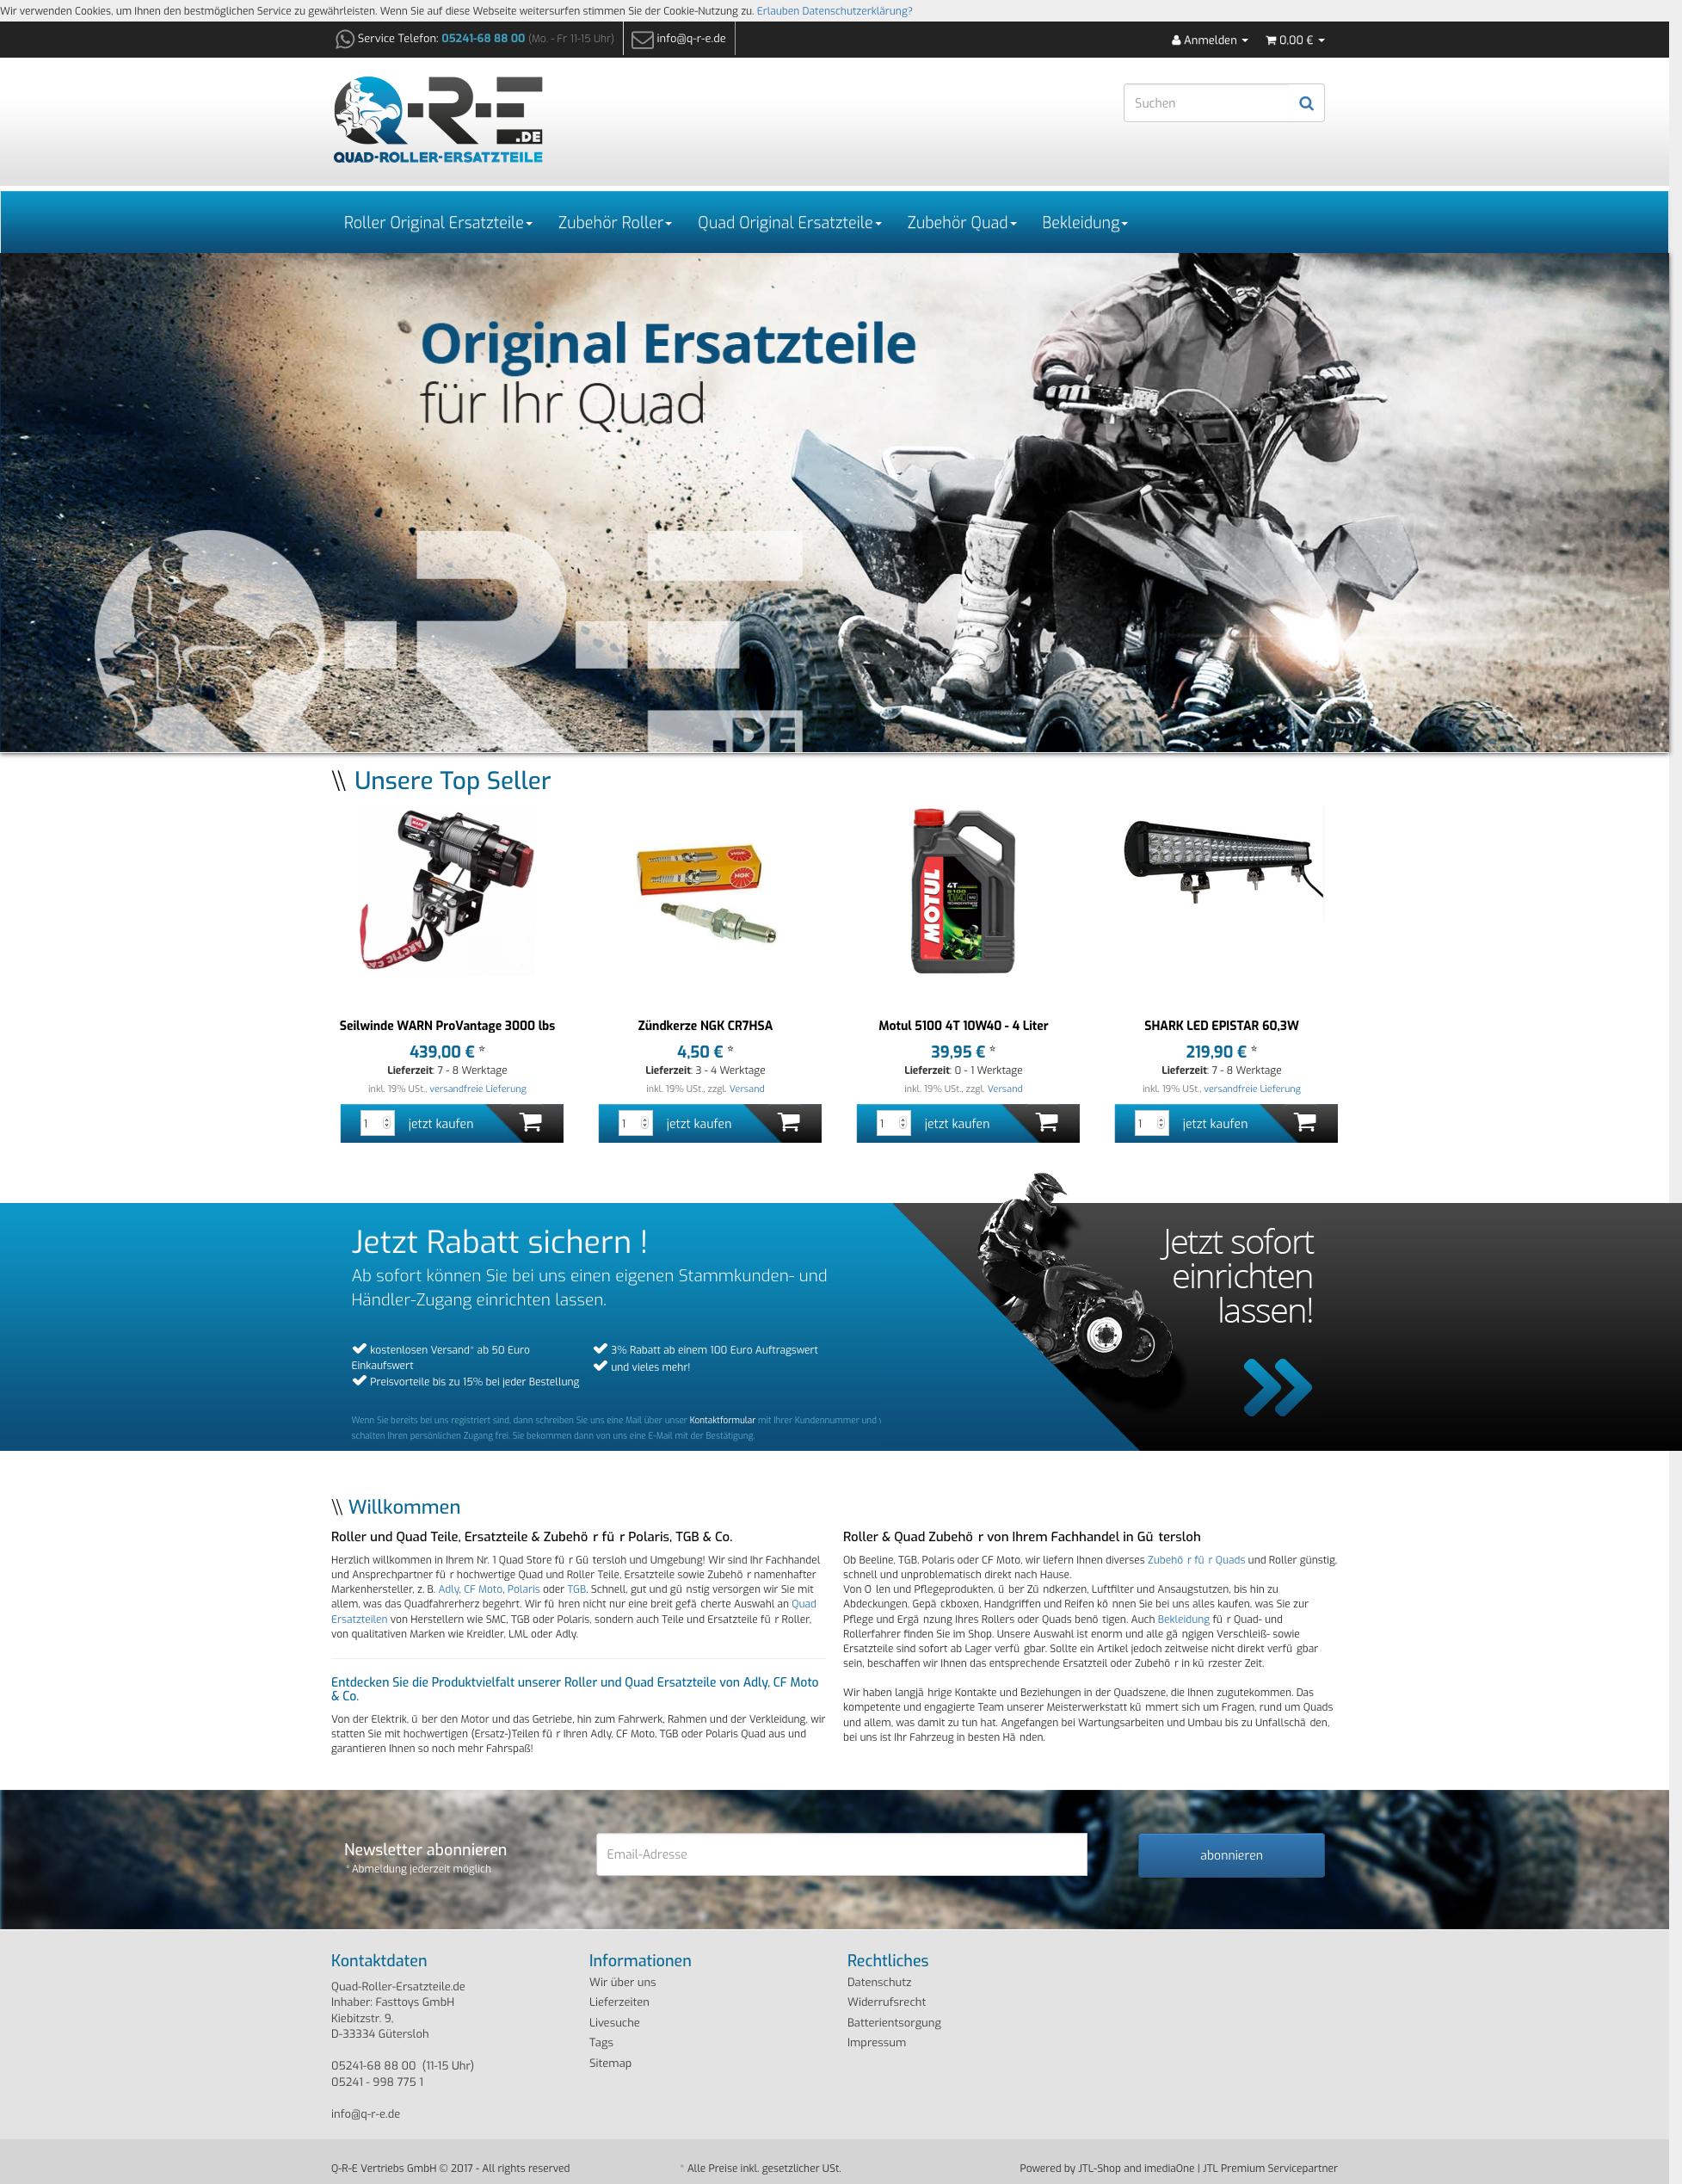 Fasttoys GmbH